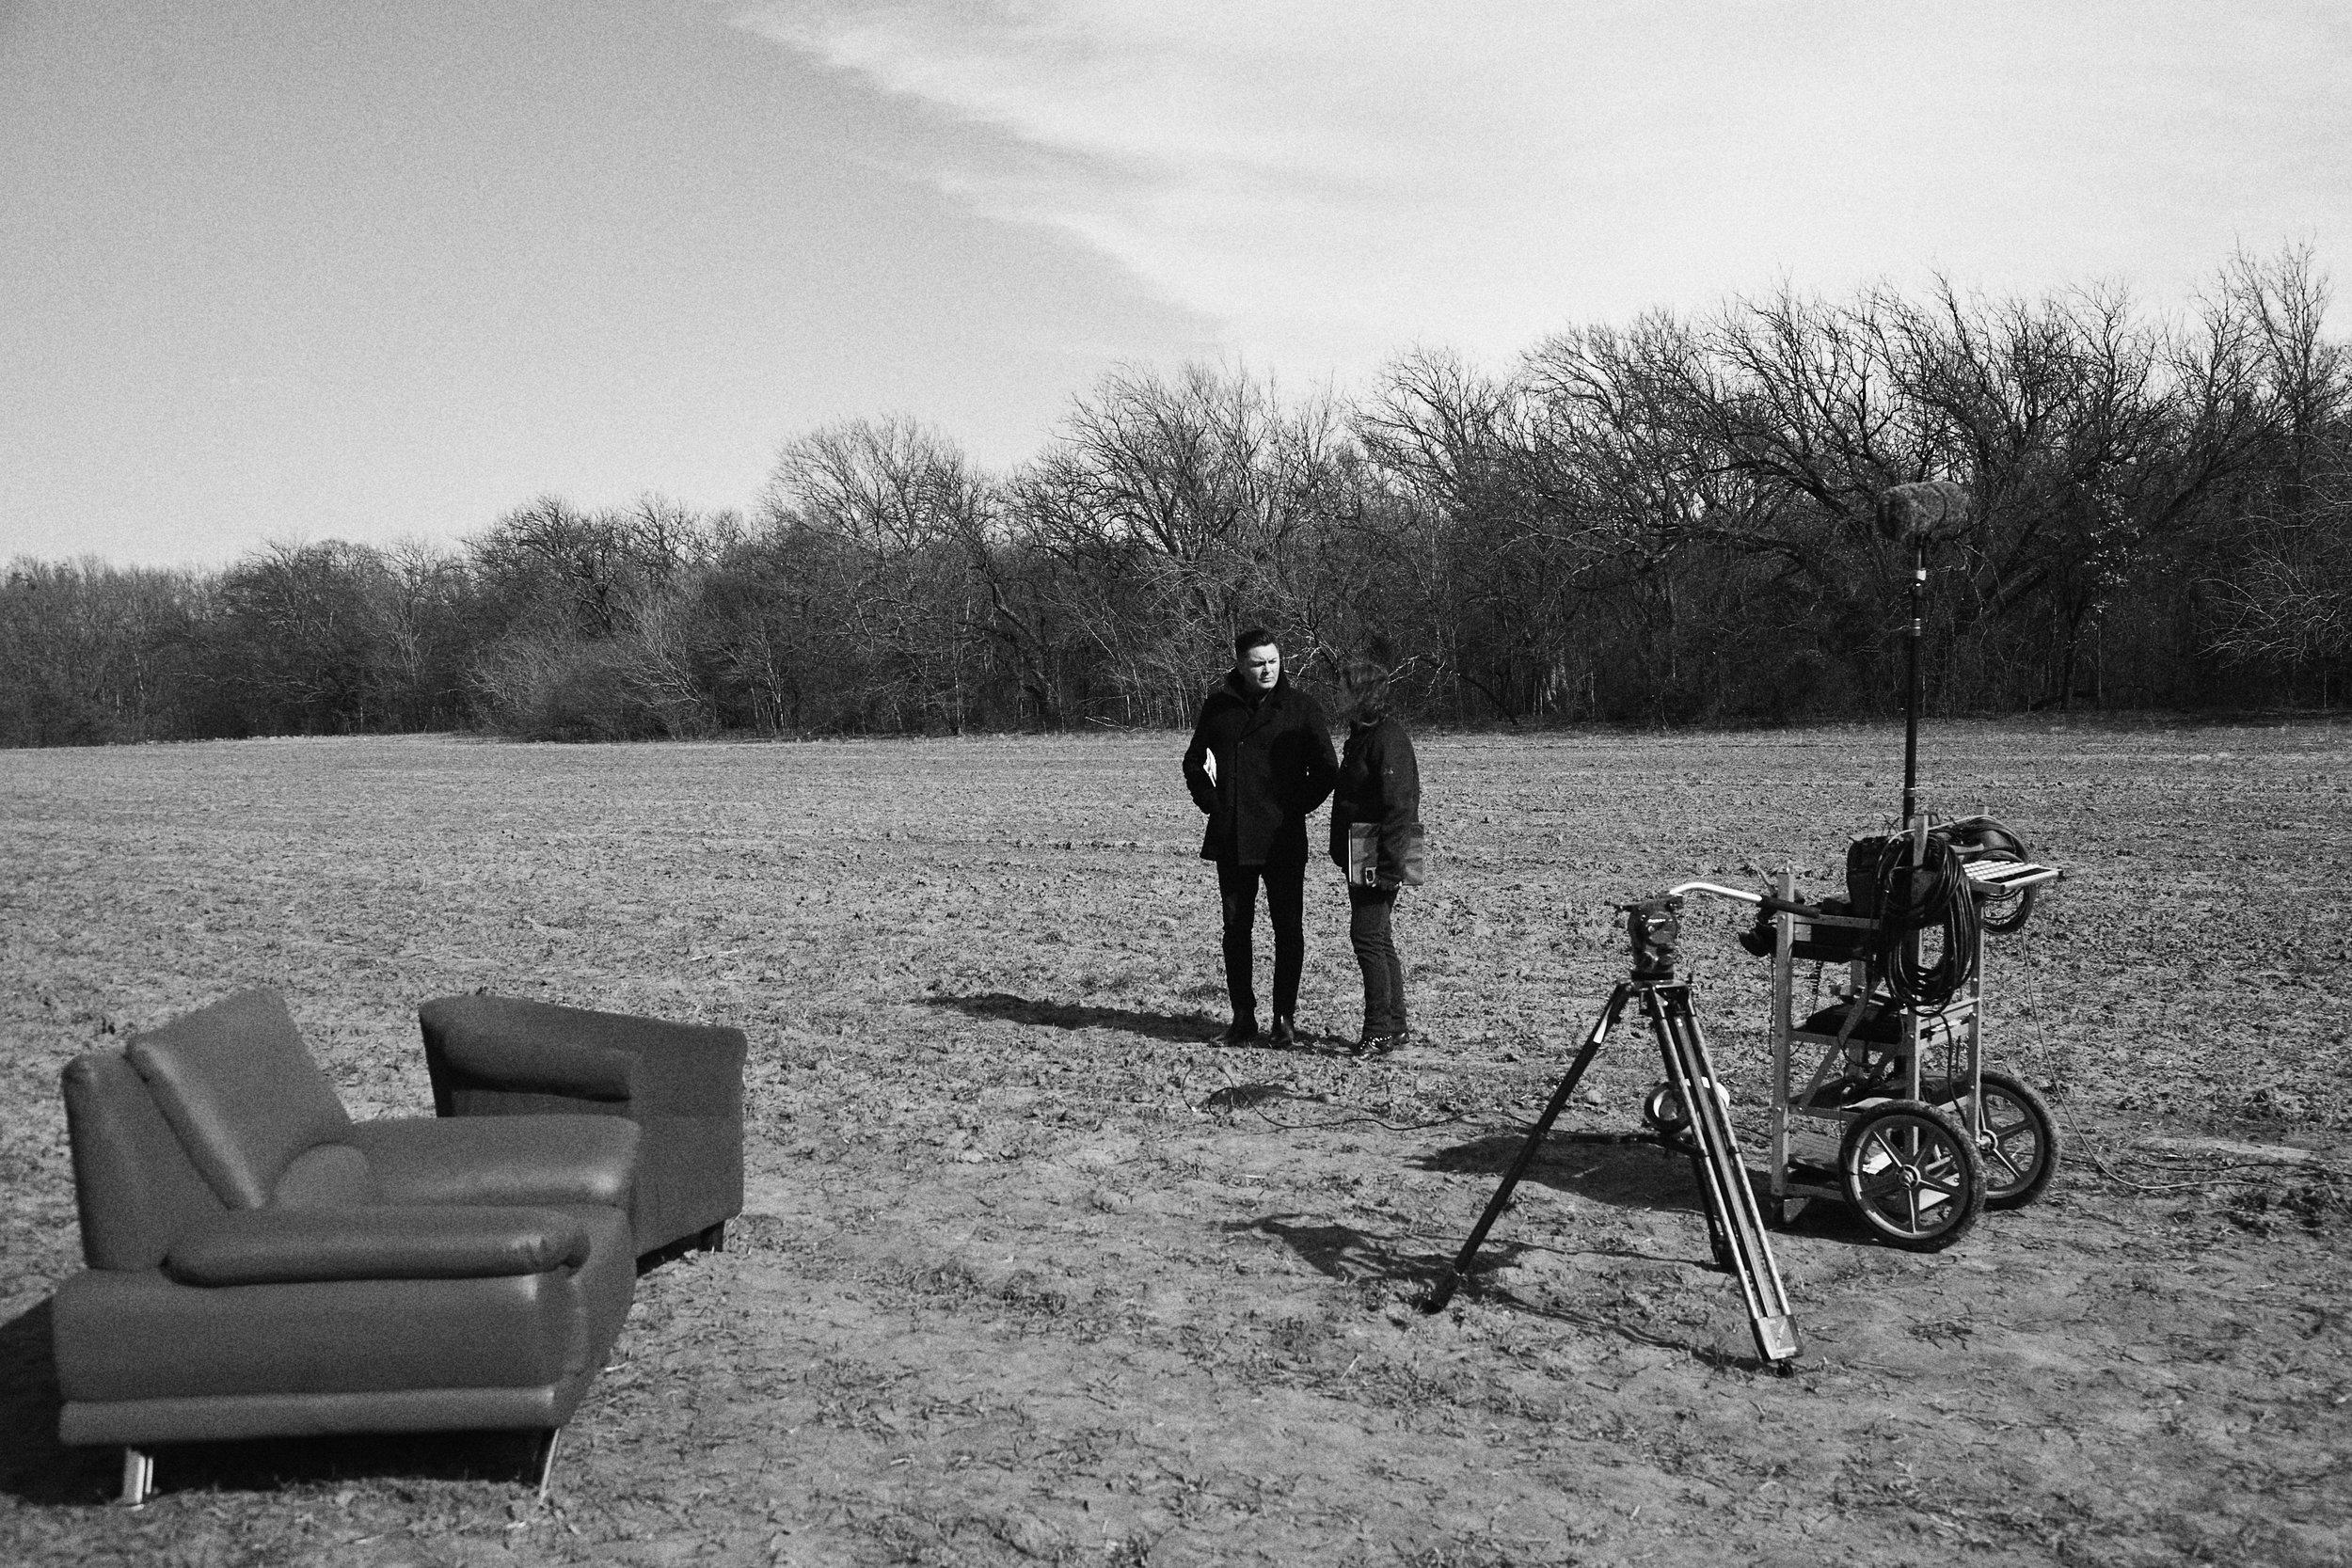 A Dialogue With God - Short Film